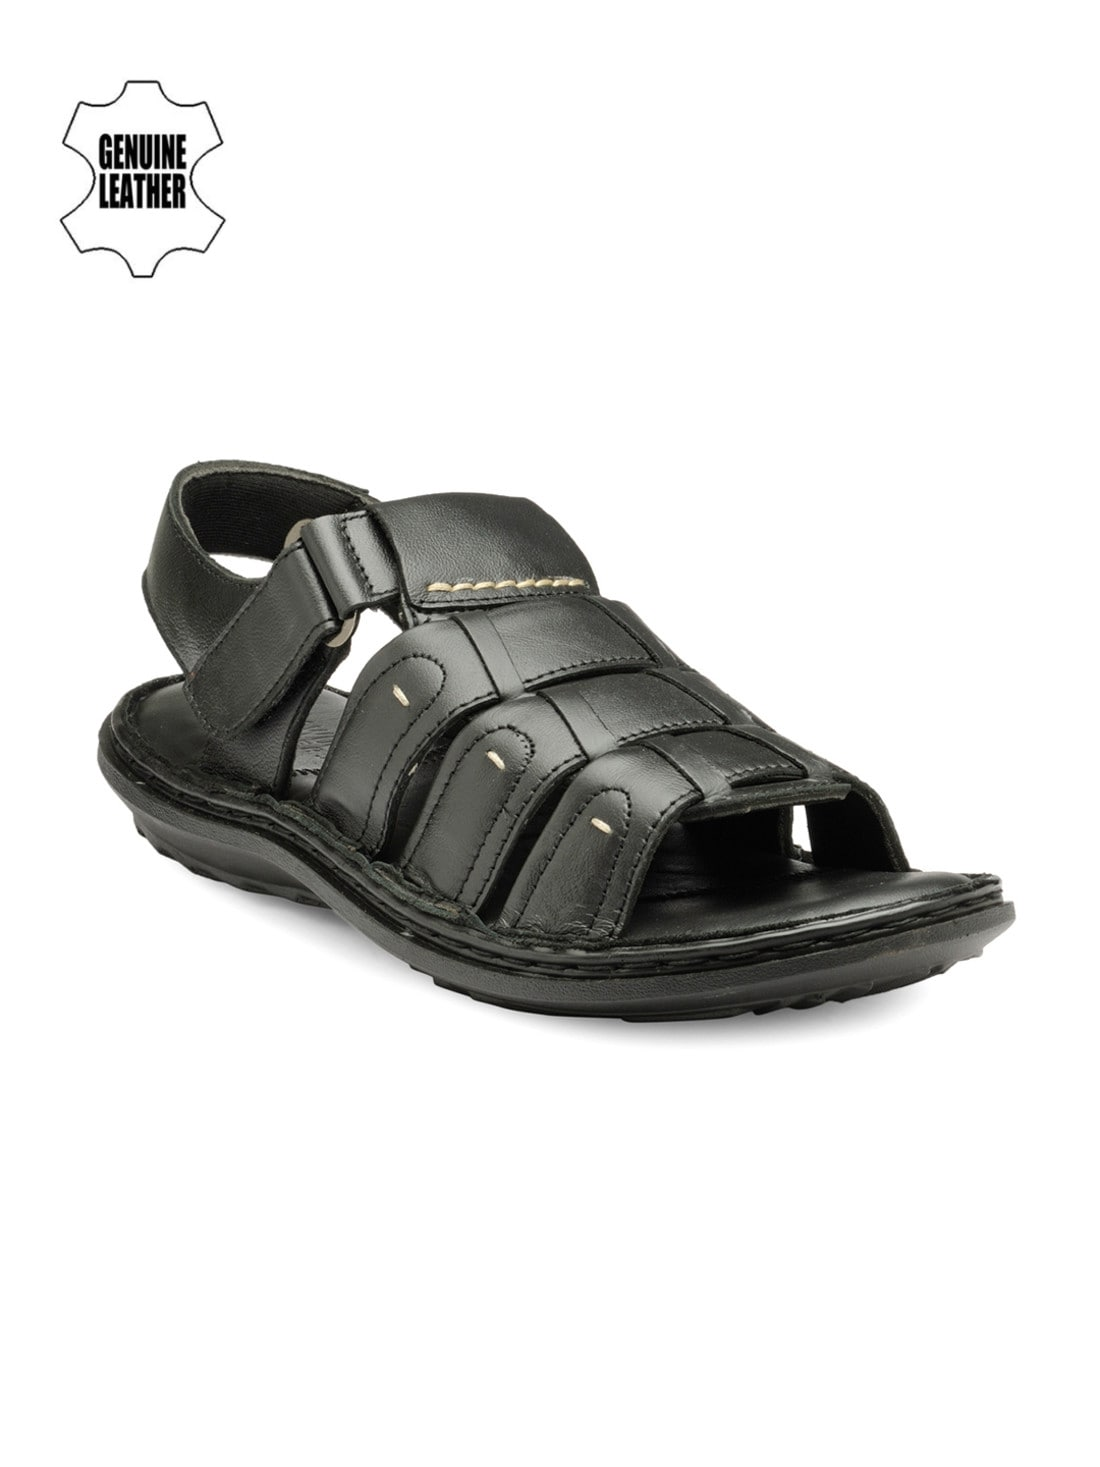 52e48a1e9 Men Sandals Sweatshirts - Buy Men Sandals Sweatshirts online in India